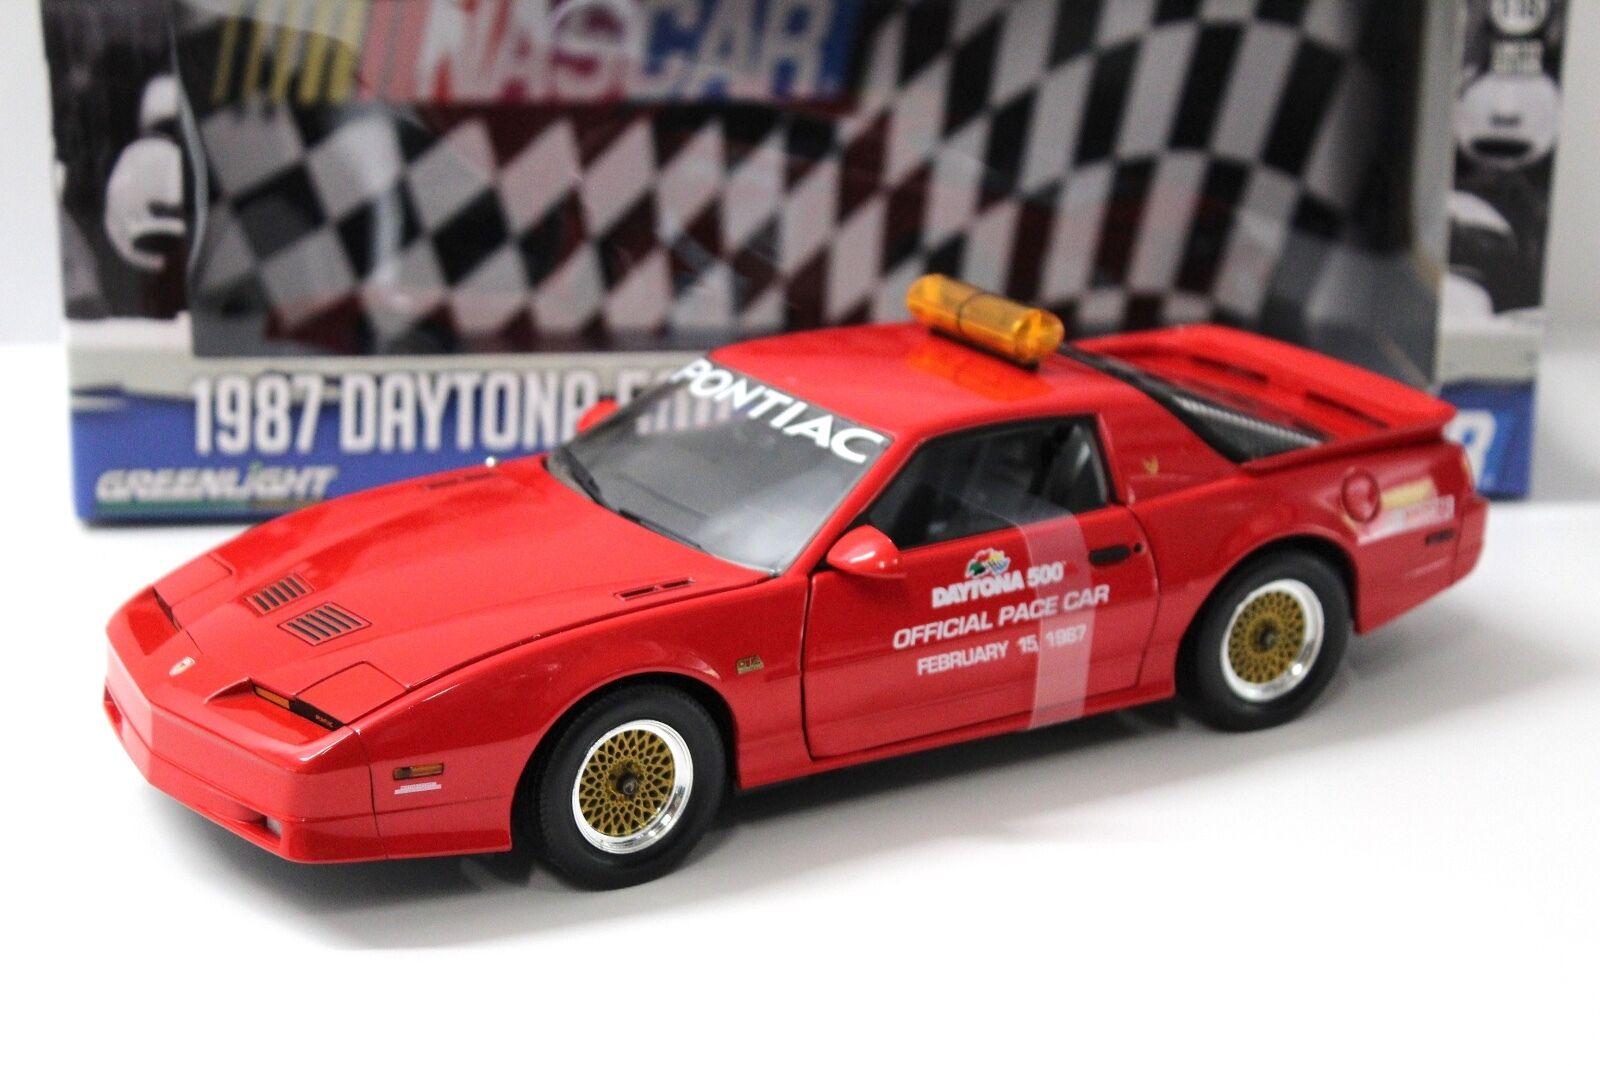 1 18 vertlight Pontiac GTA 1987 Daytona 500 Pace Car New chez Premium-modelcars